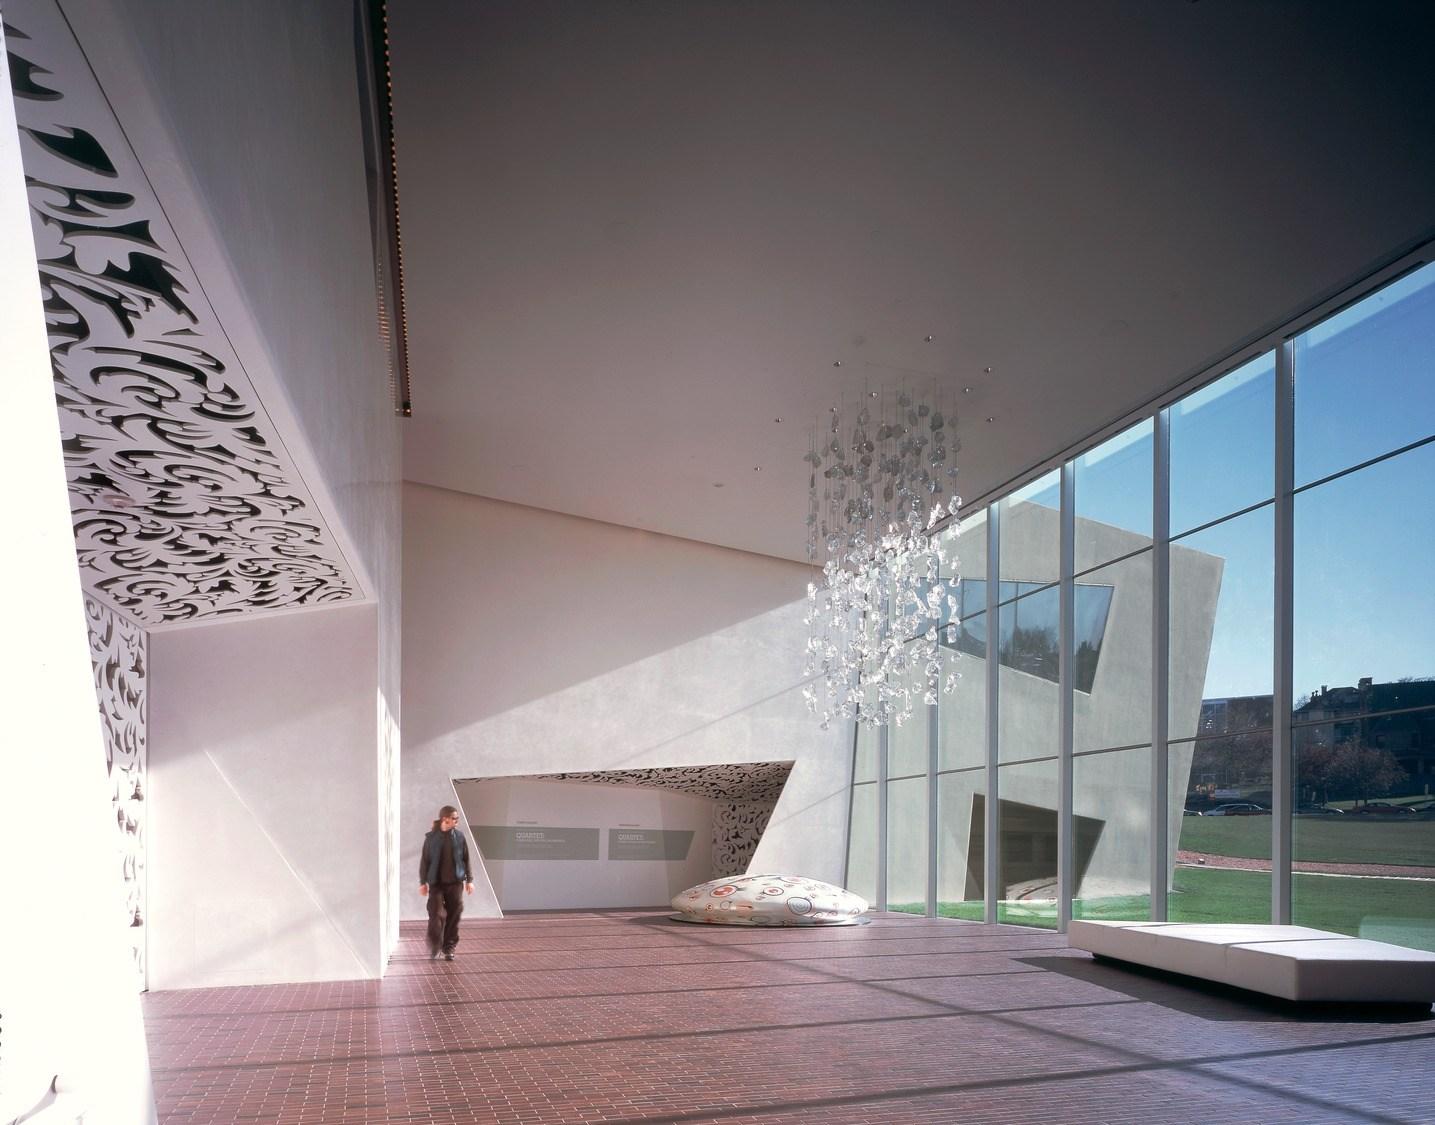 Walker art center expansion hga - Interior design classes minneapolis ...